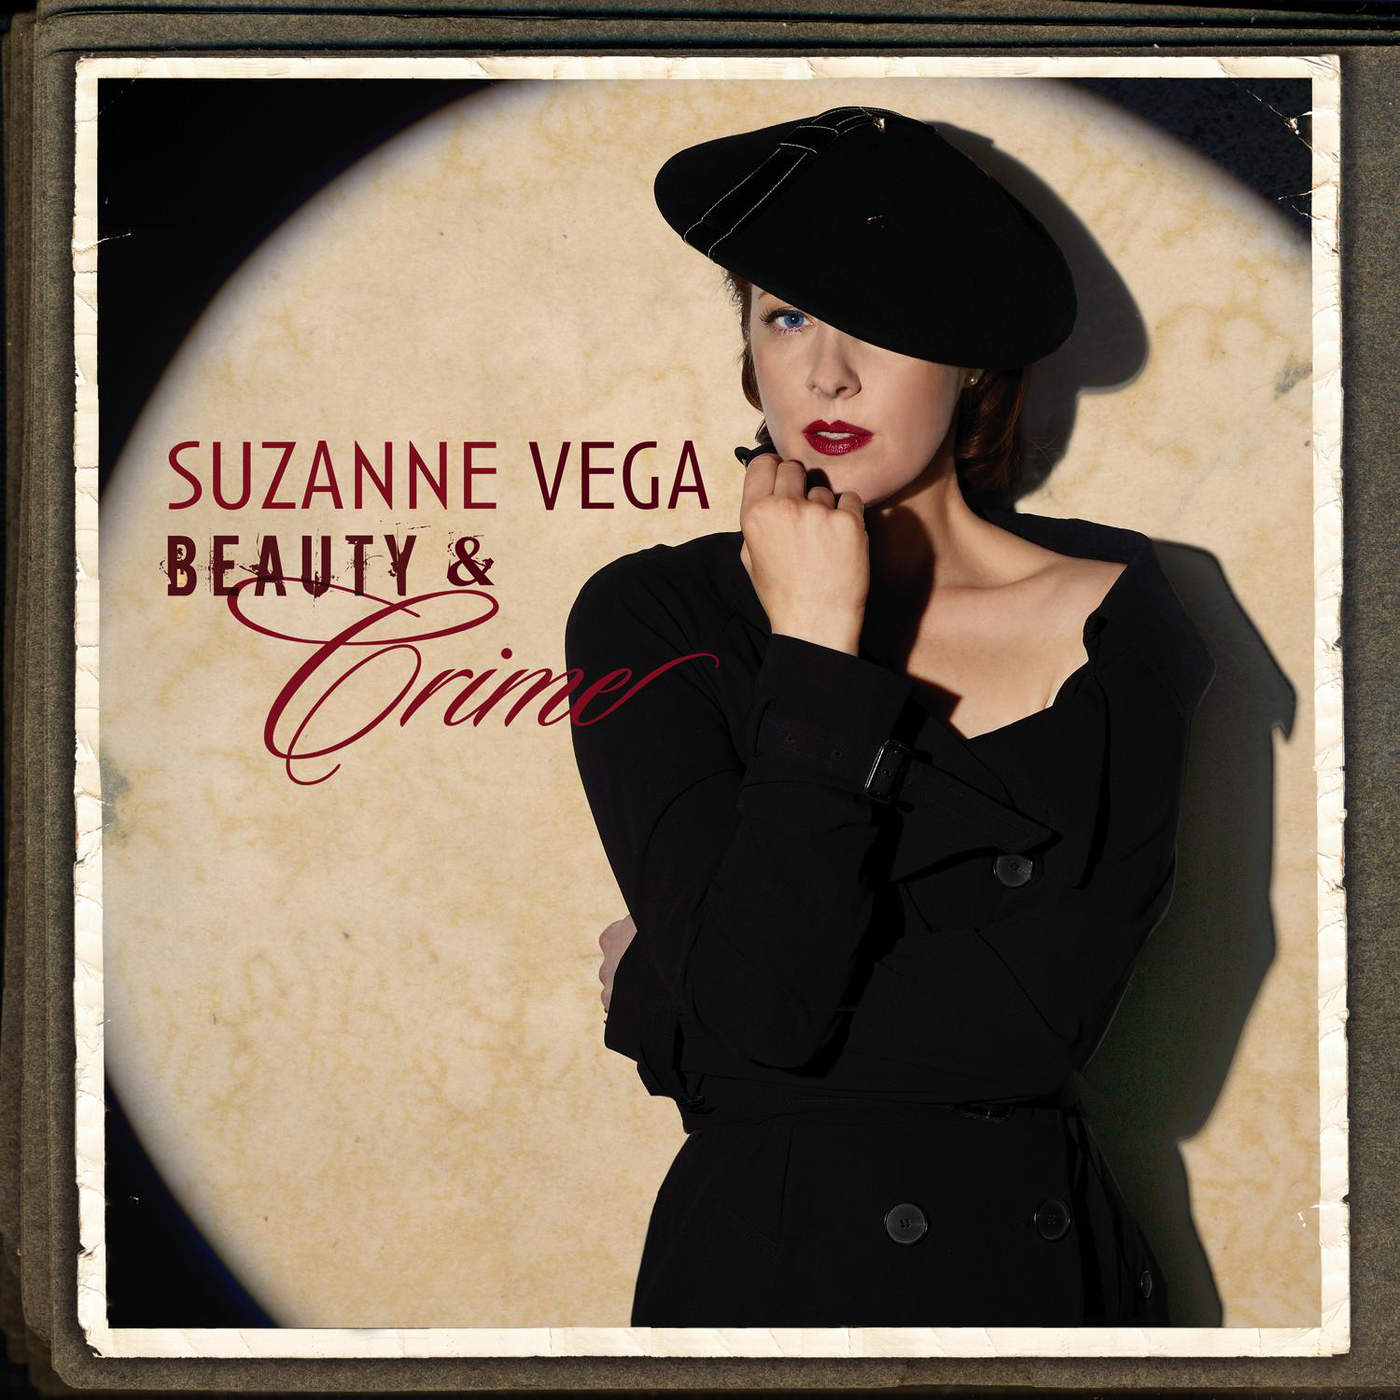 Frank & Ava by Suzanne Vega